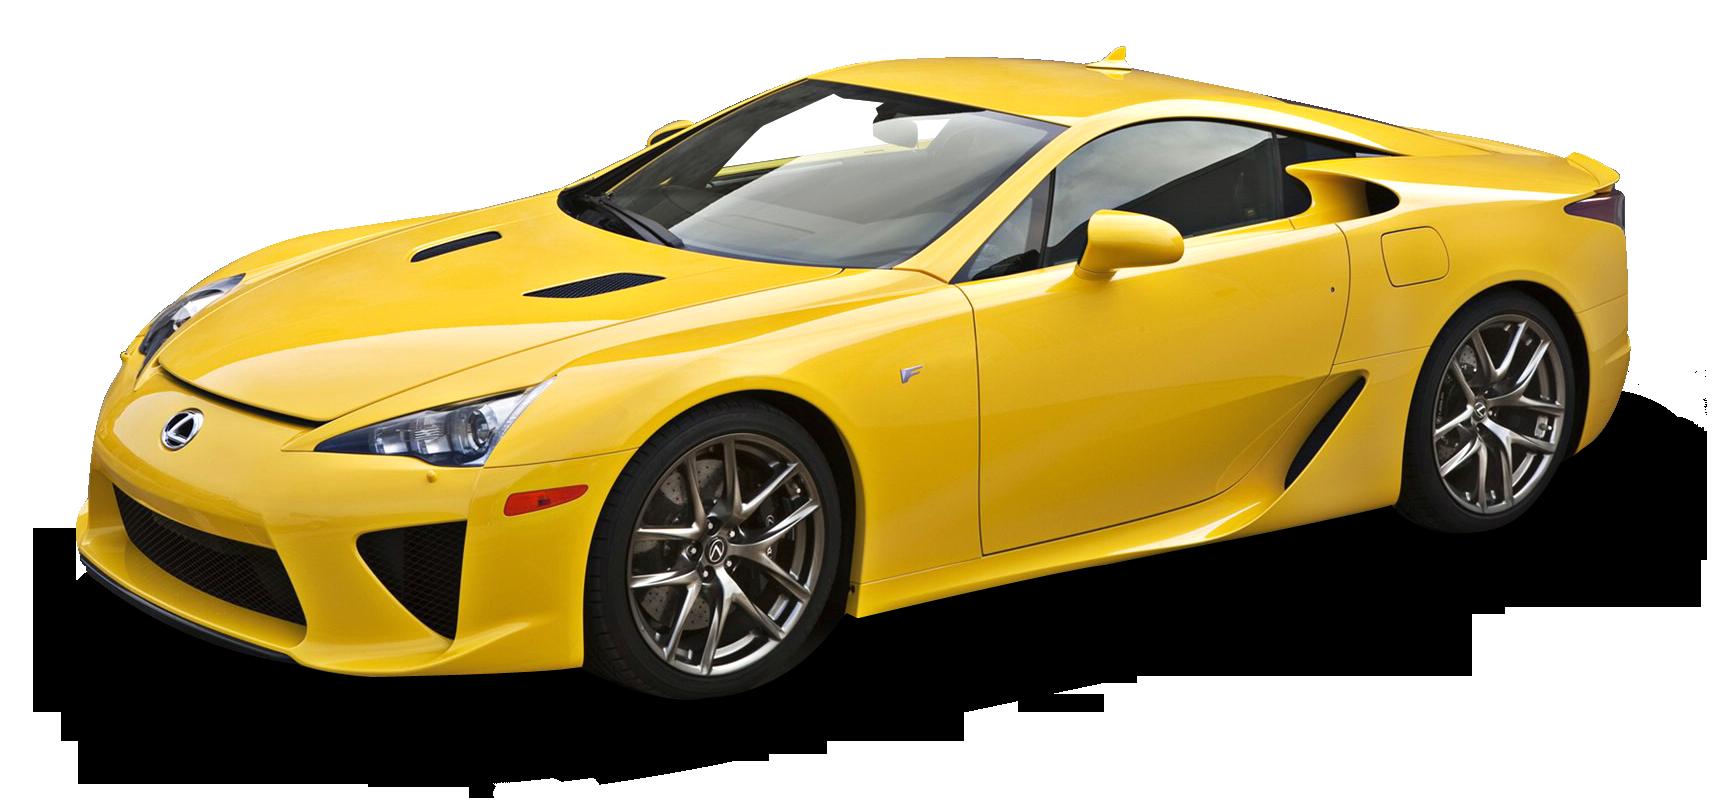 Yellow Lexus Lfa Car Png Image Lexus Lfa Lexus Car